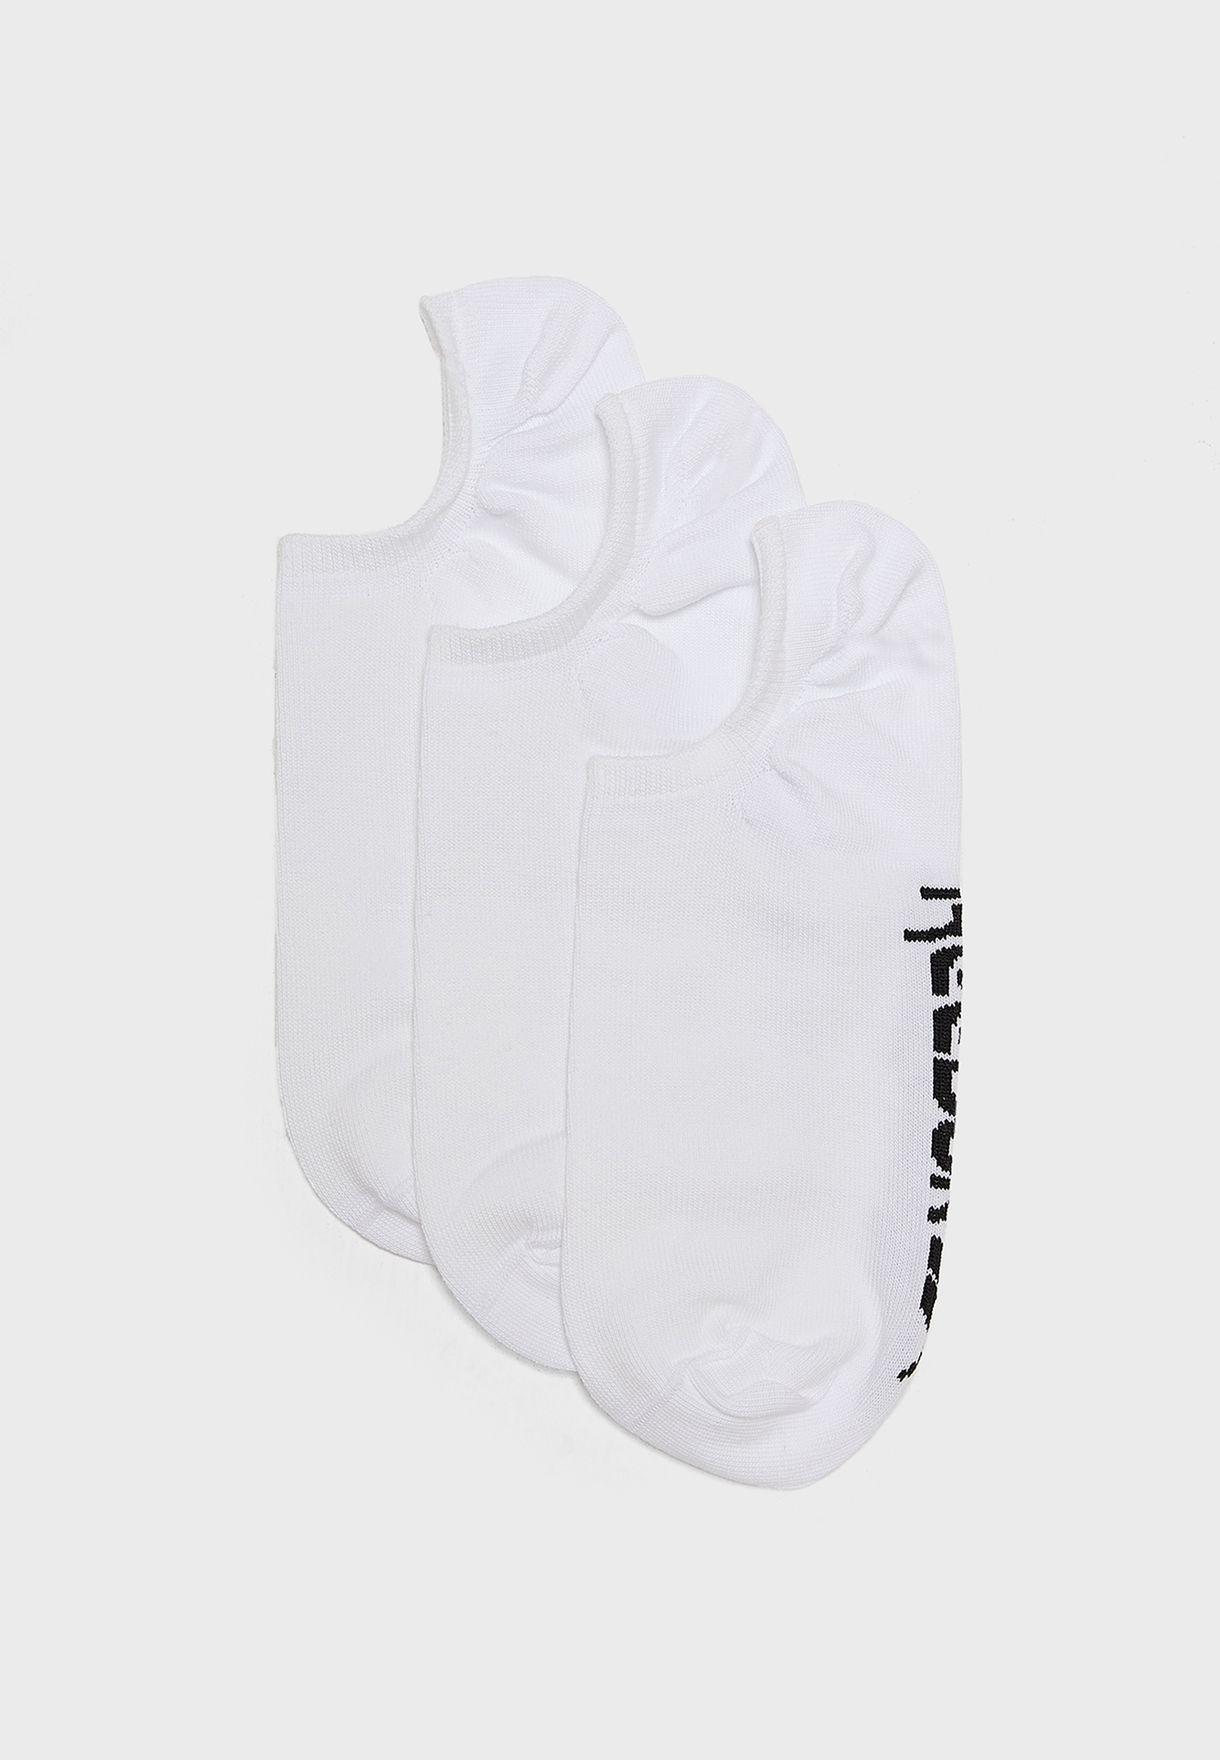 Invisible Elements Sports Unisex Training No Show Socks